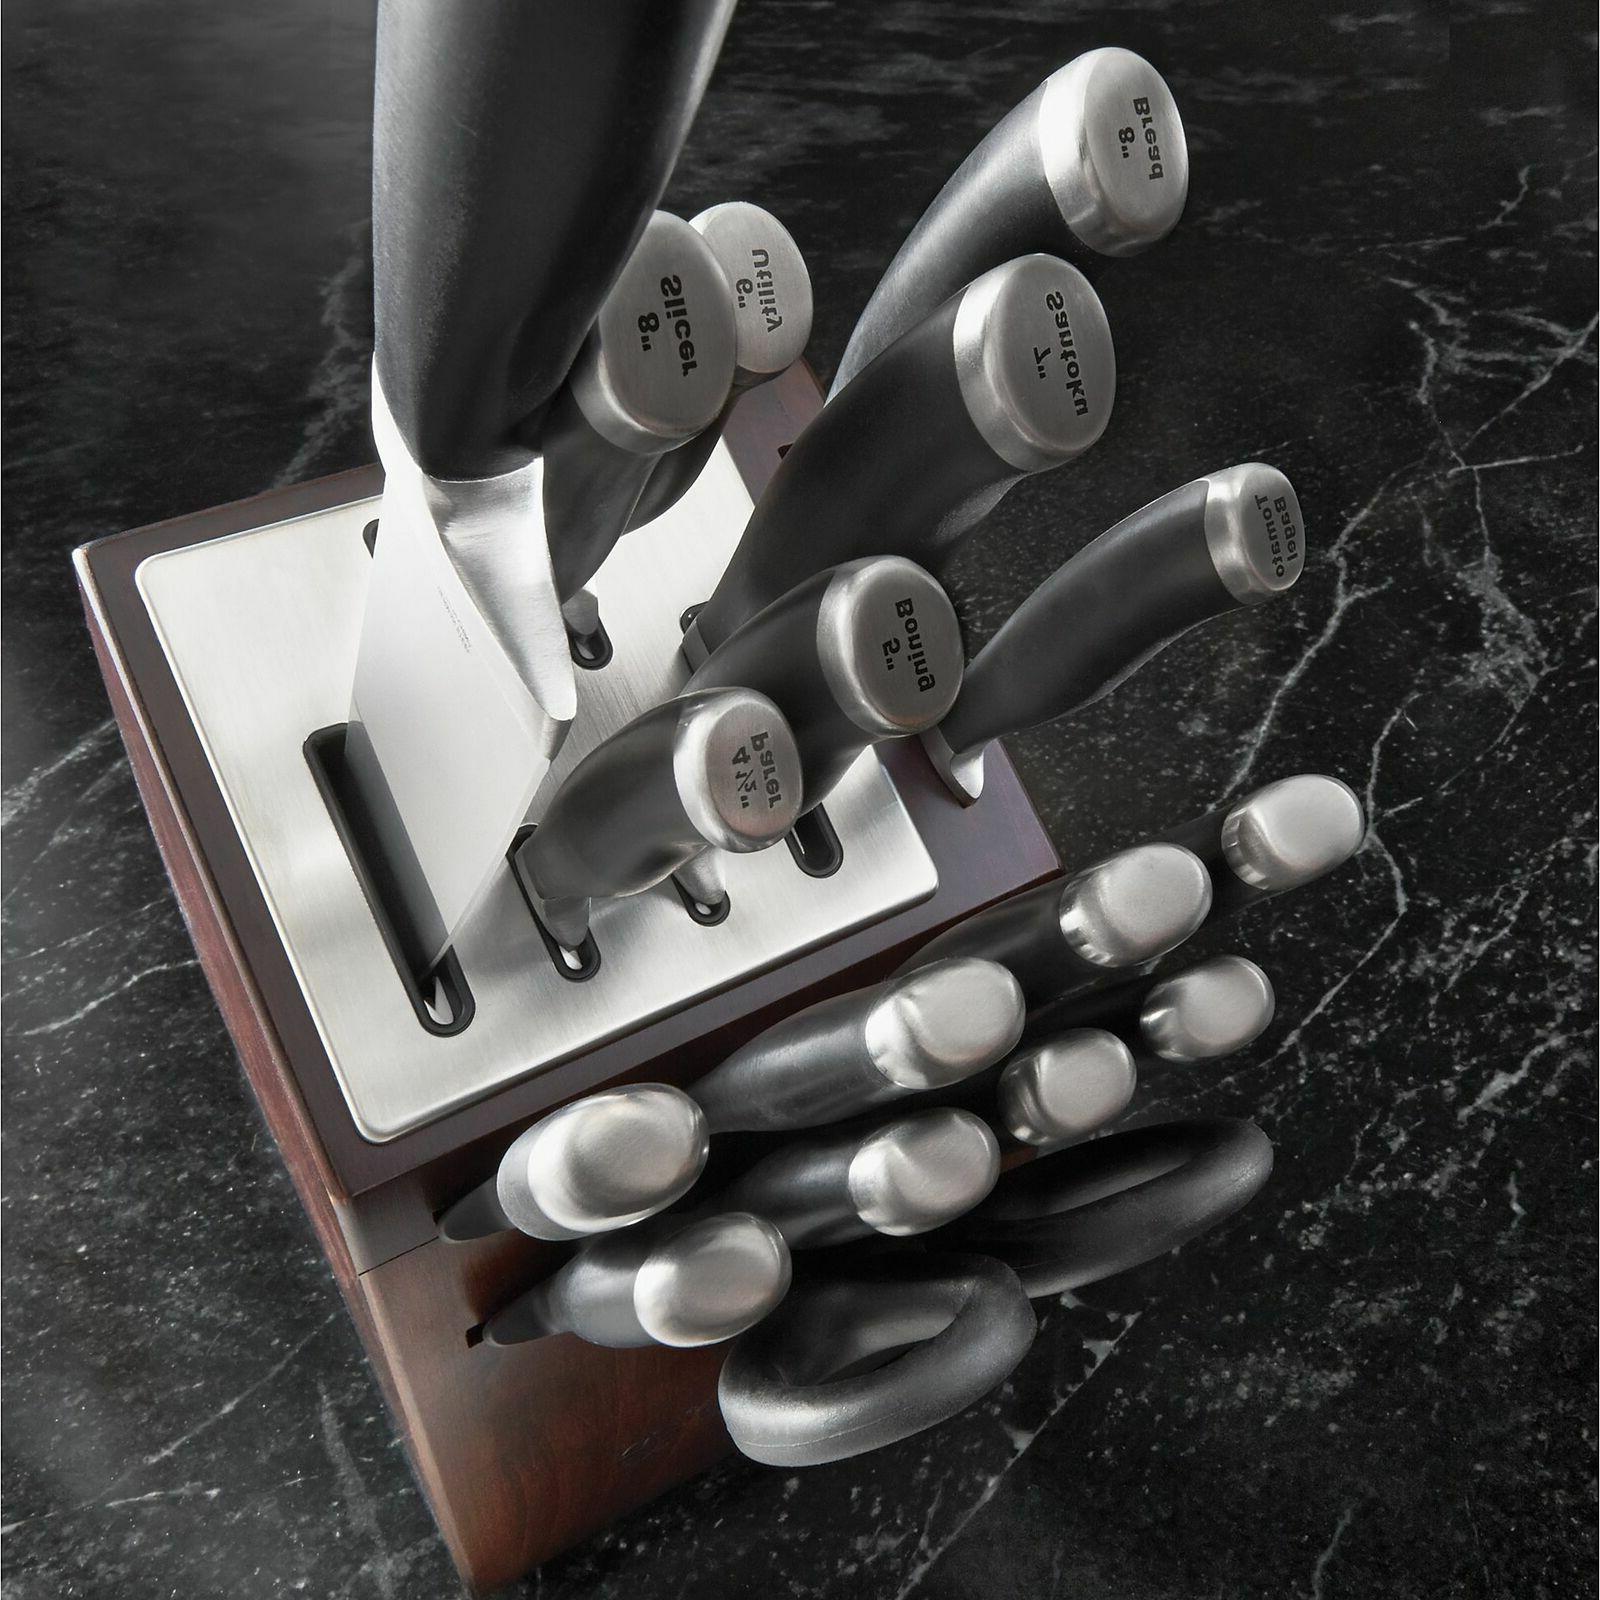 Calphalon Self-Sharpening 18-Piece Set